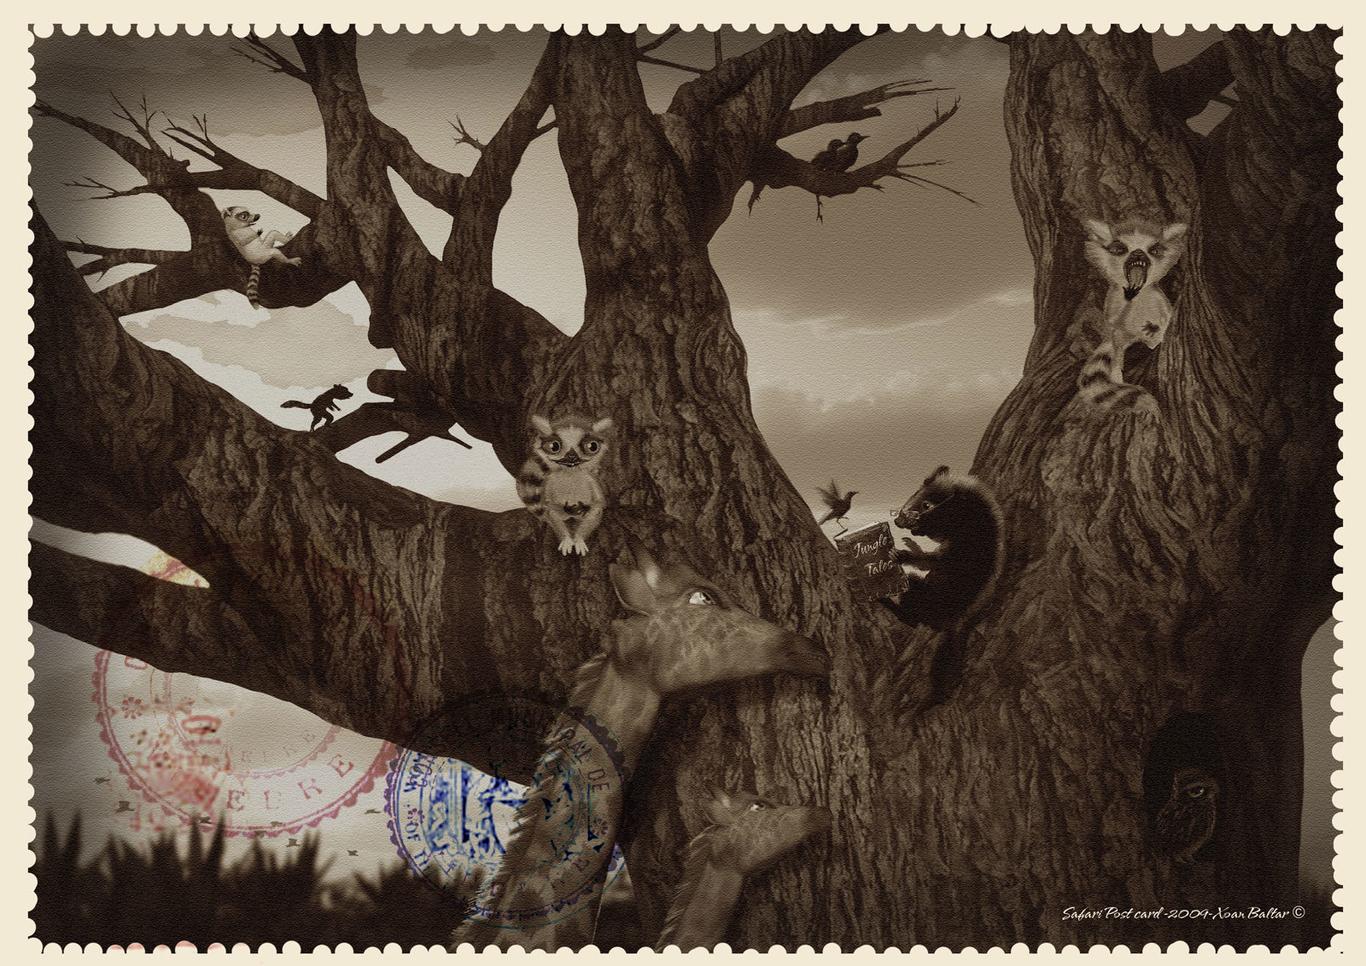 Xoanbaltar post card 1 0a2580da r6vt